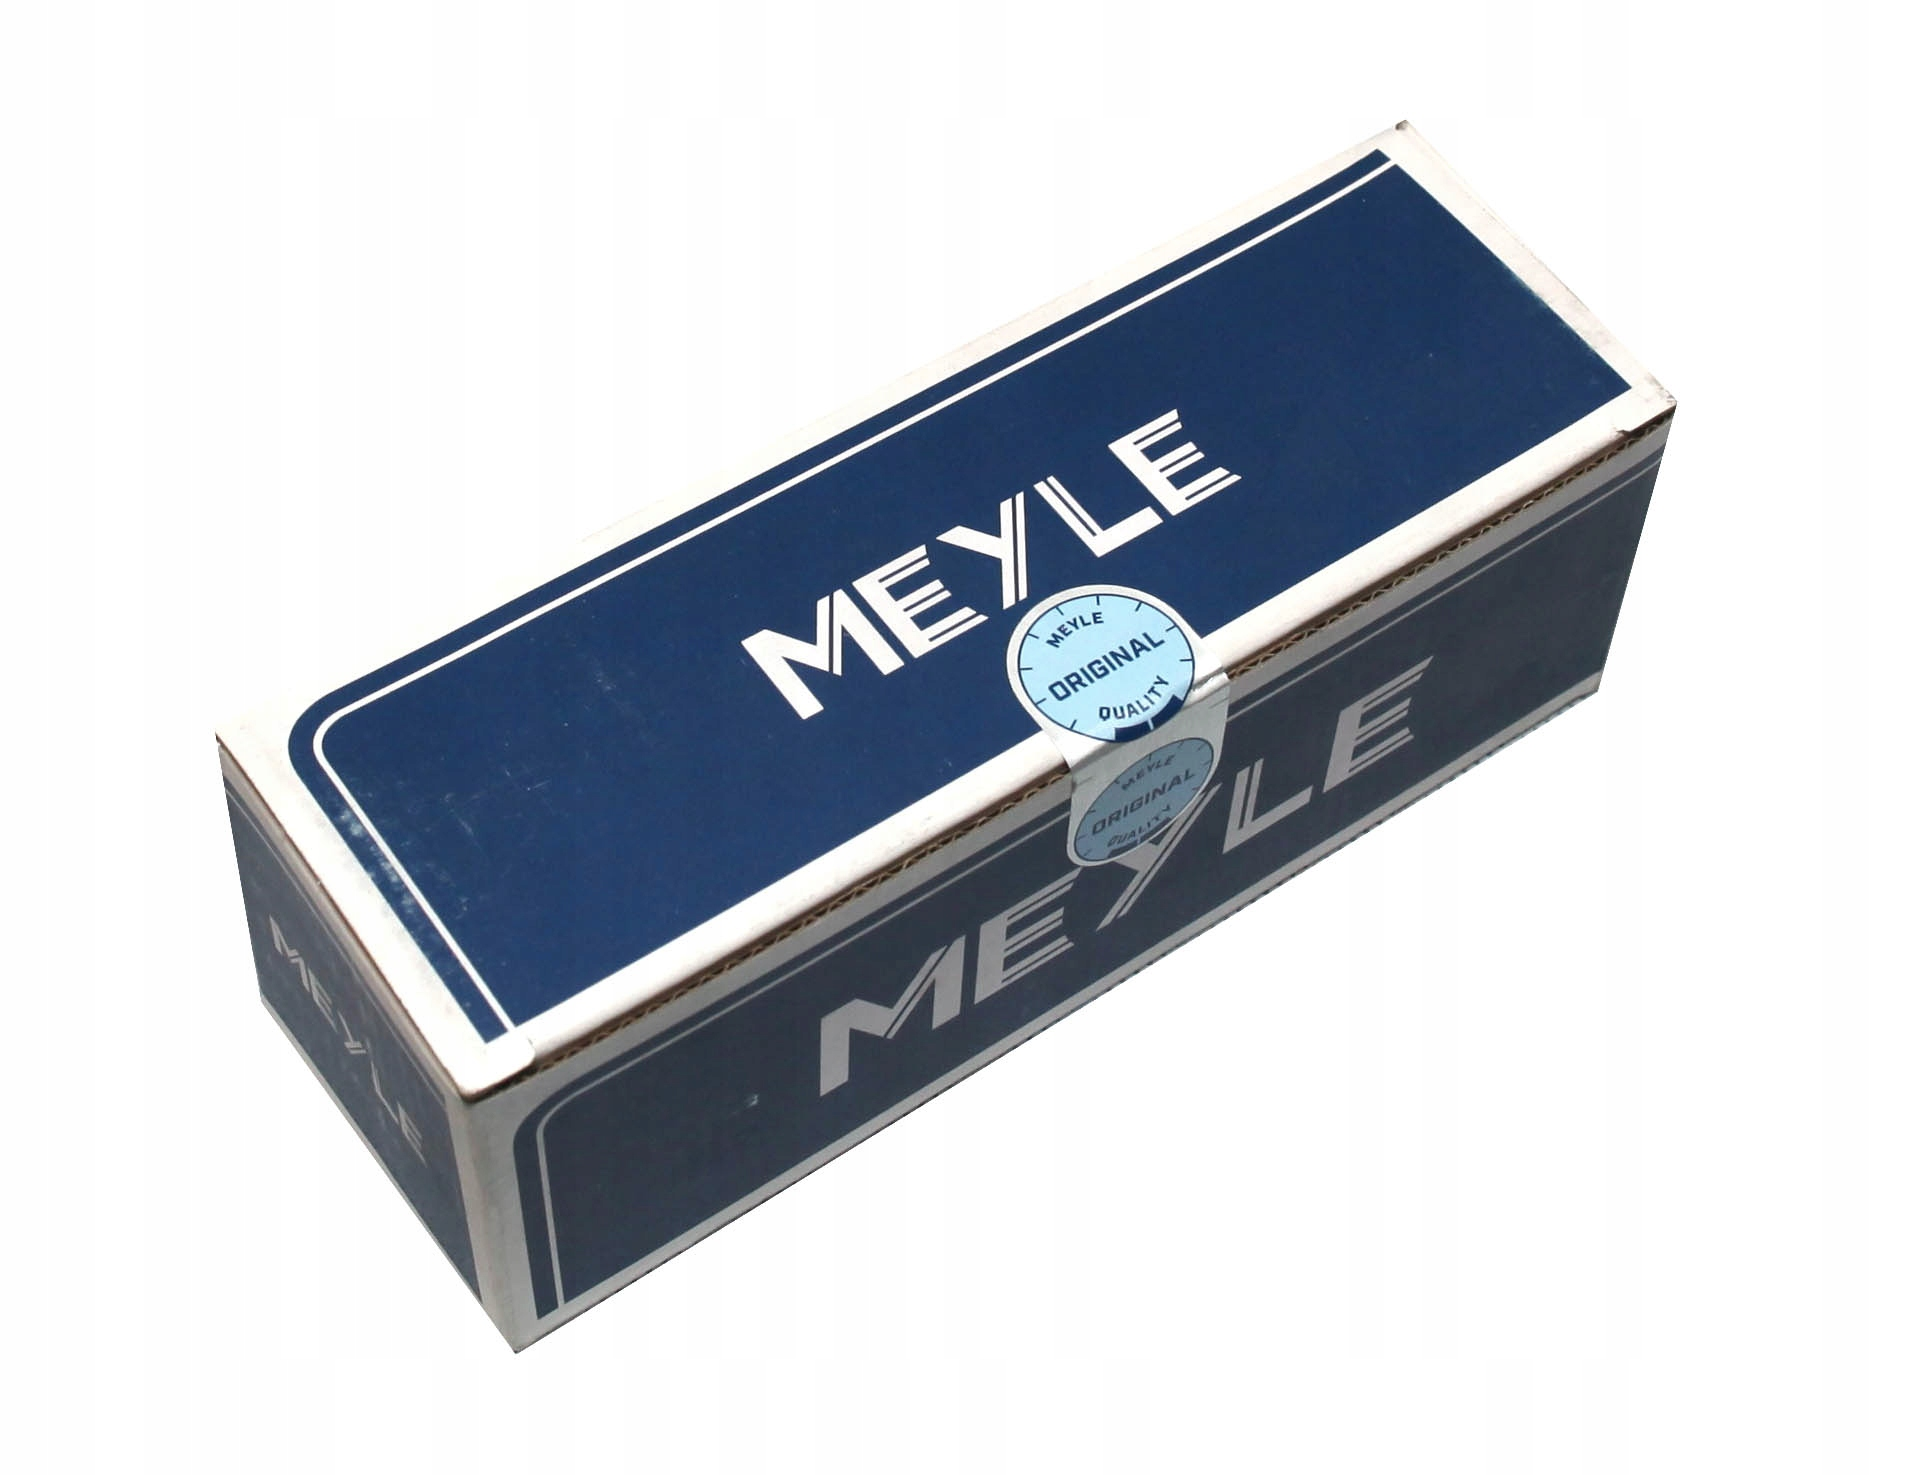 16-16 060 0011/HD MEYLE CONNECTOR STABILIZER OPEL